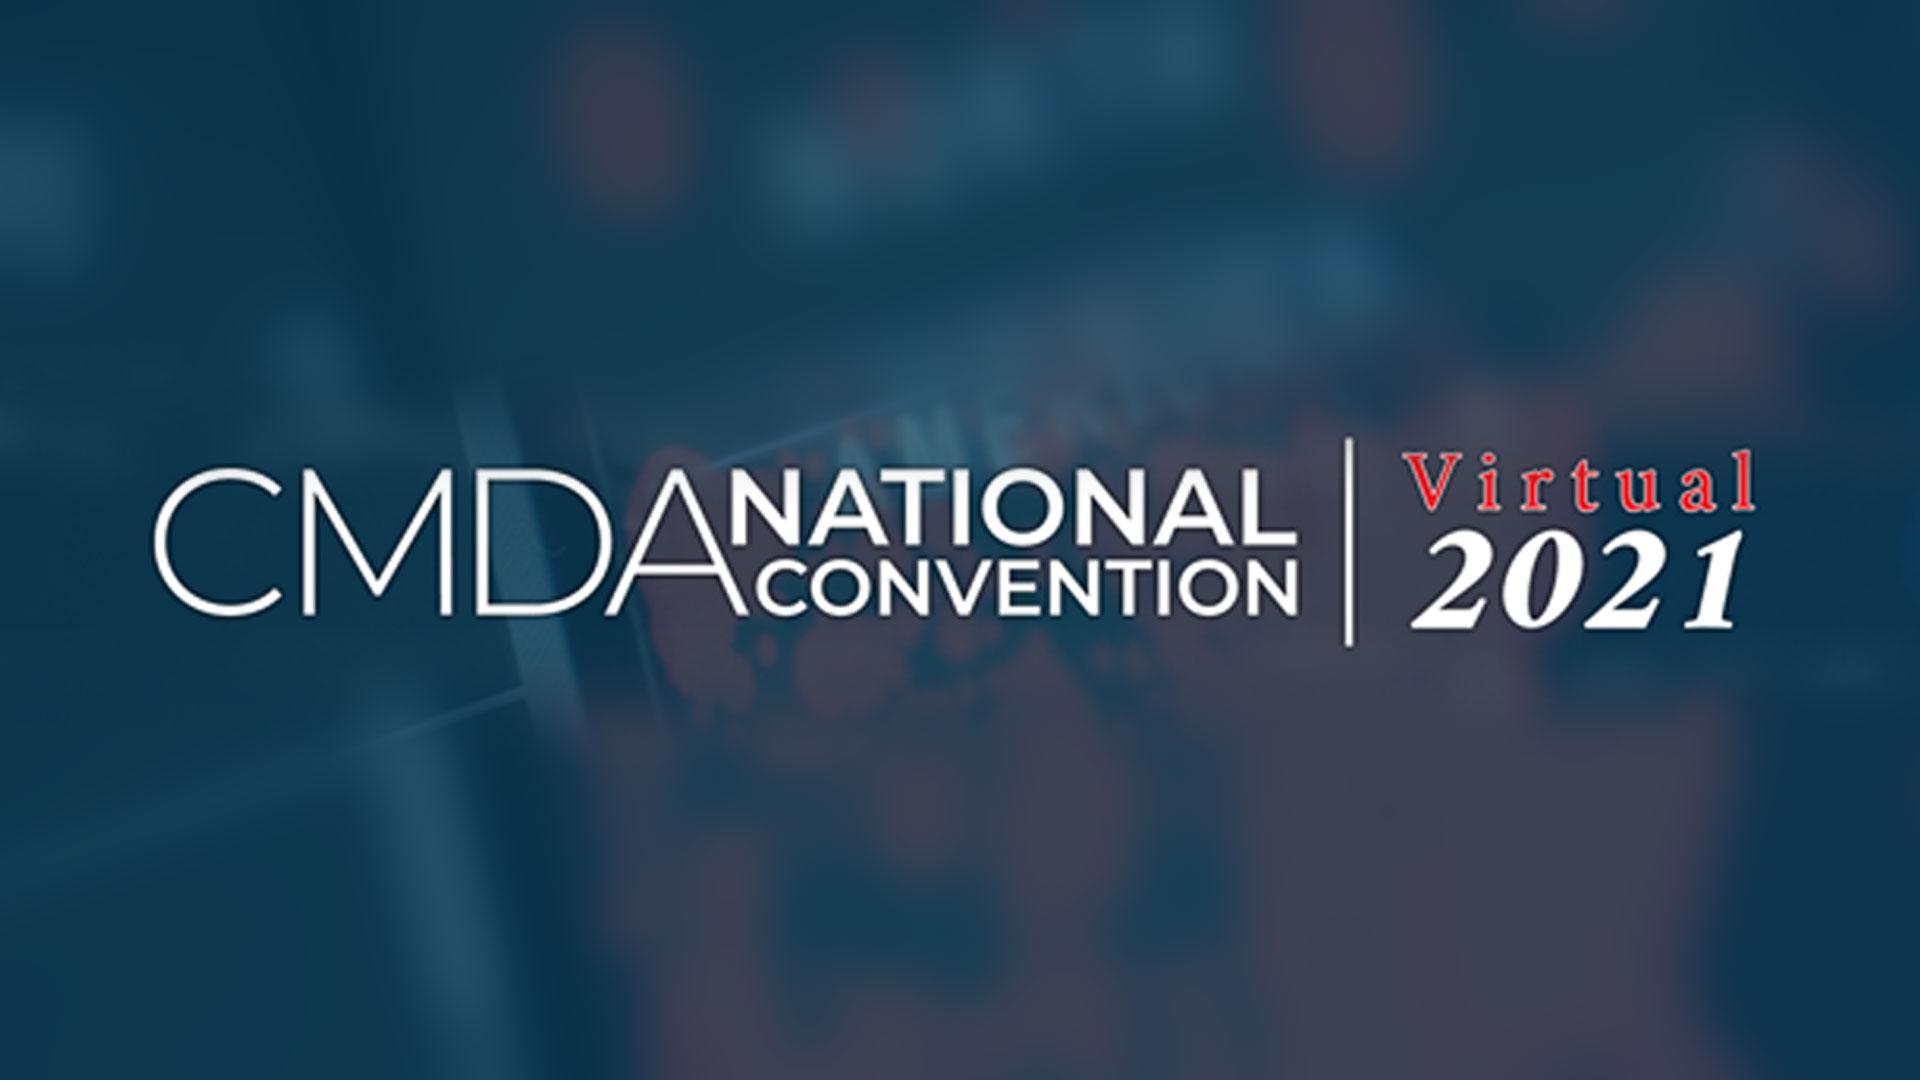 CMDA National Convention 2021